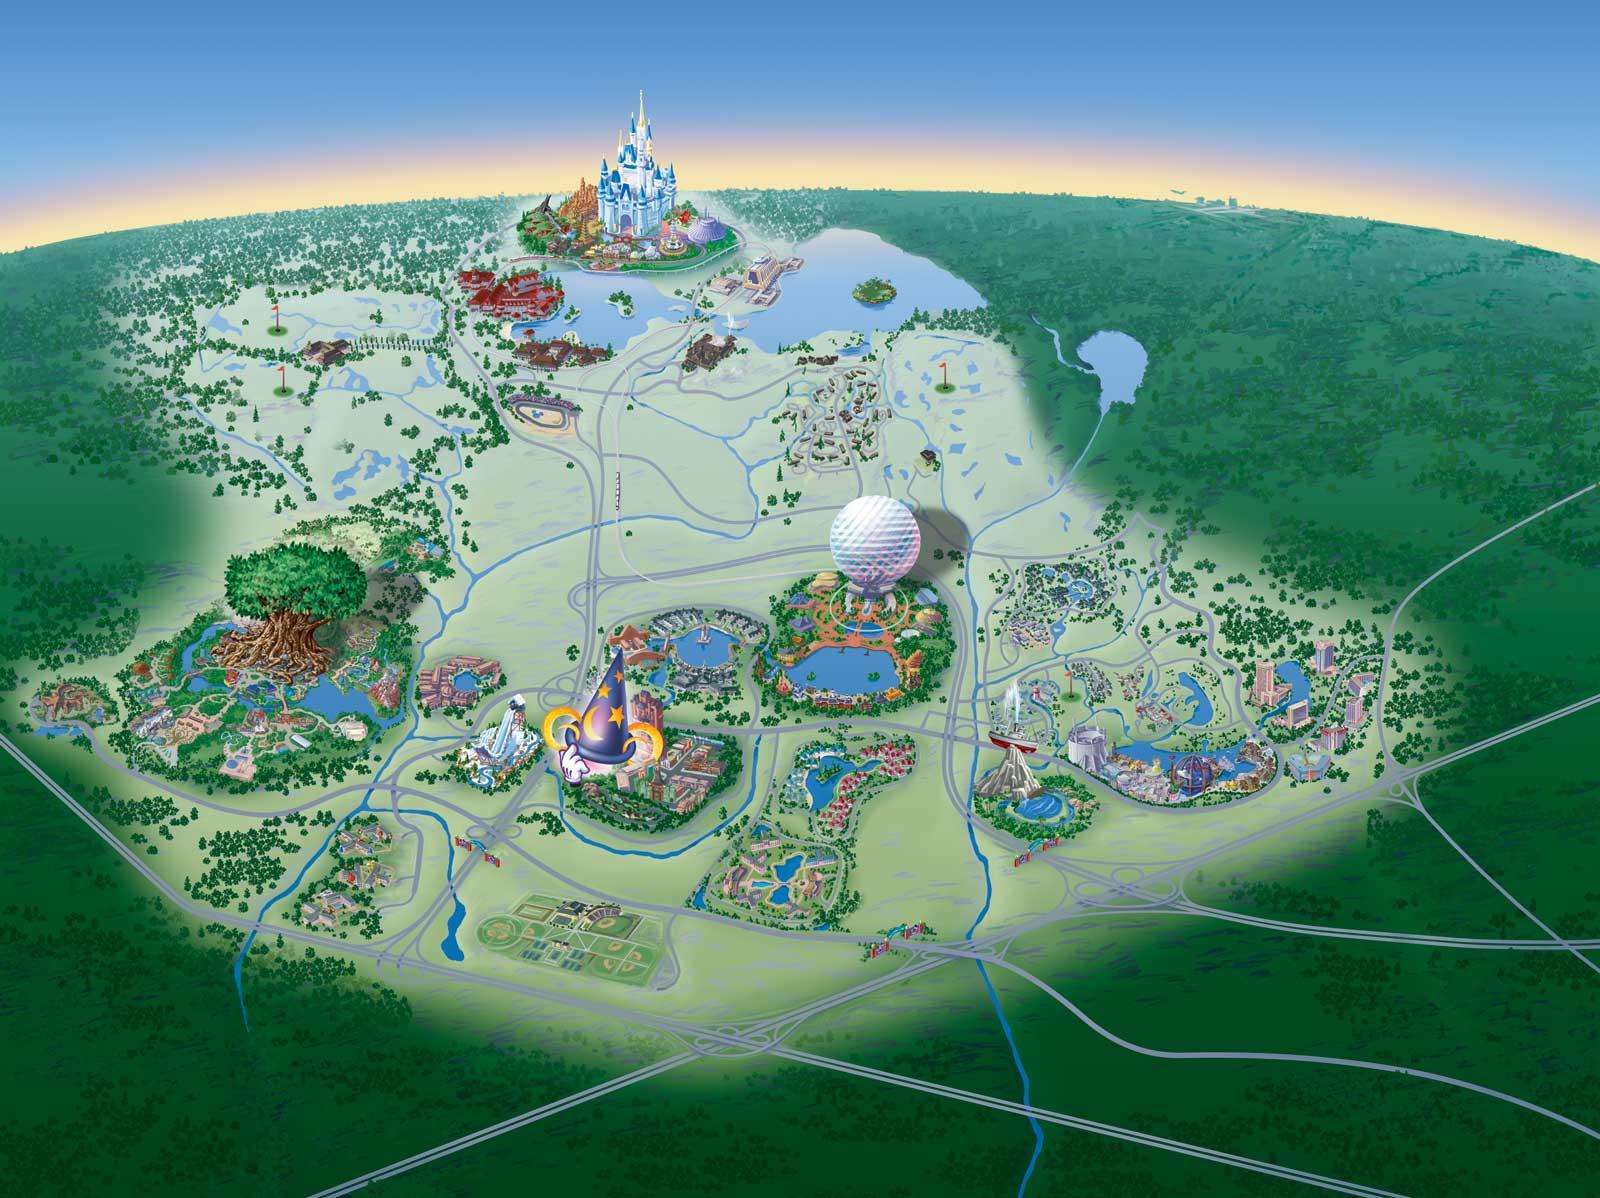 Map Of Walt Disney World Resort - Wdwinfo - Disney Hotels Florida Map